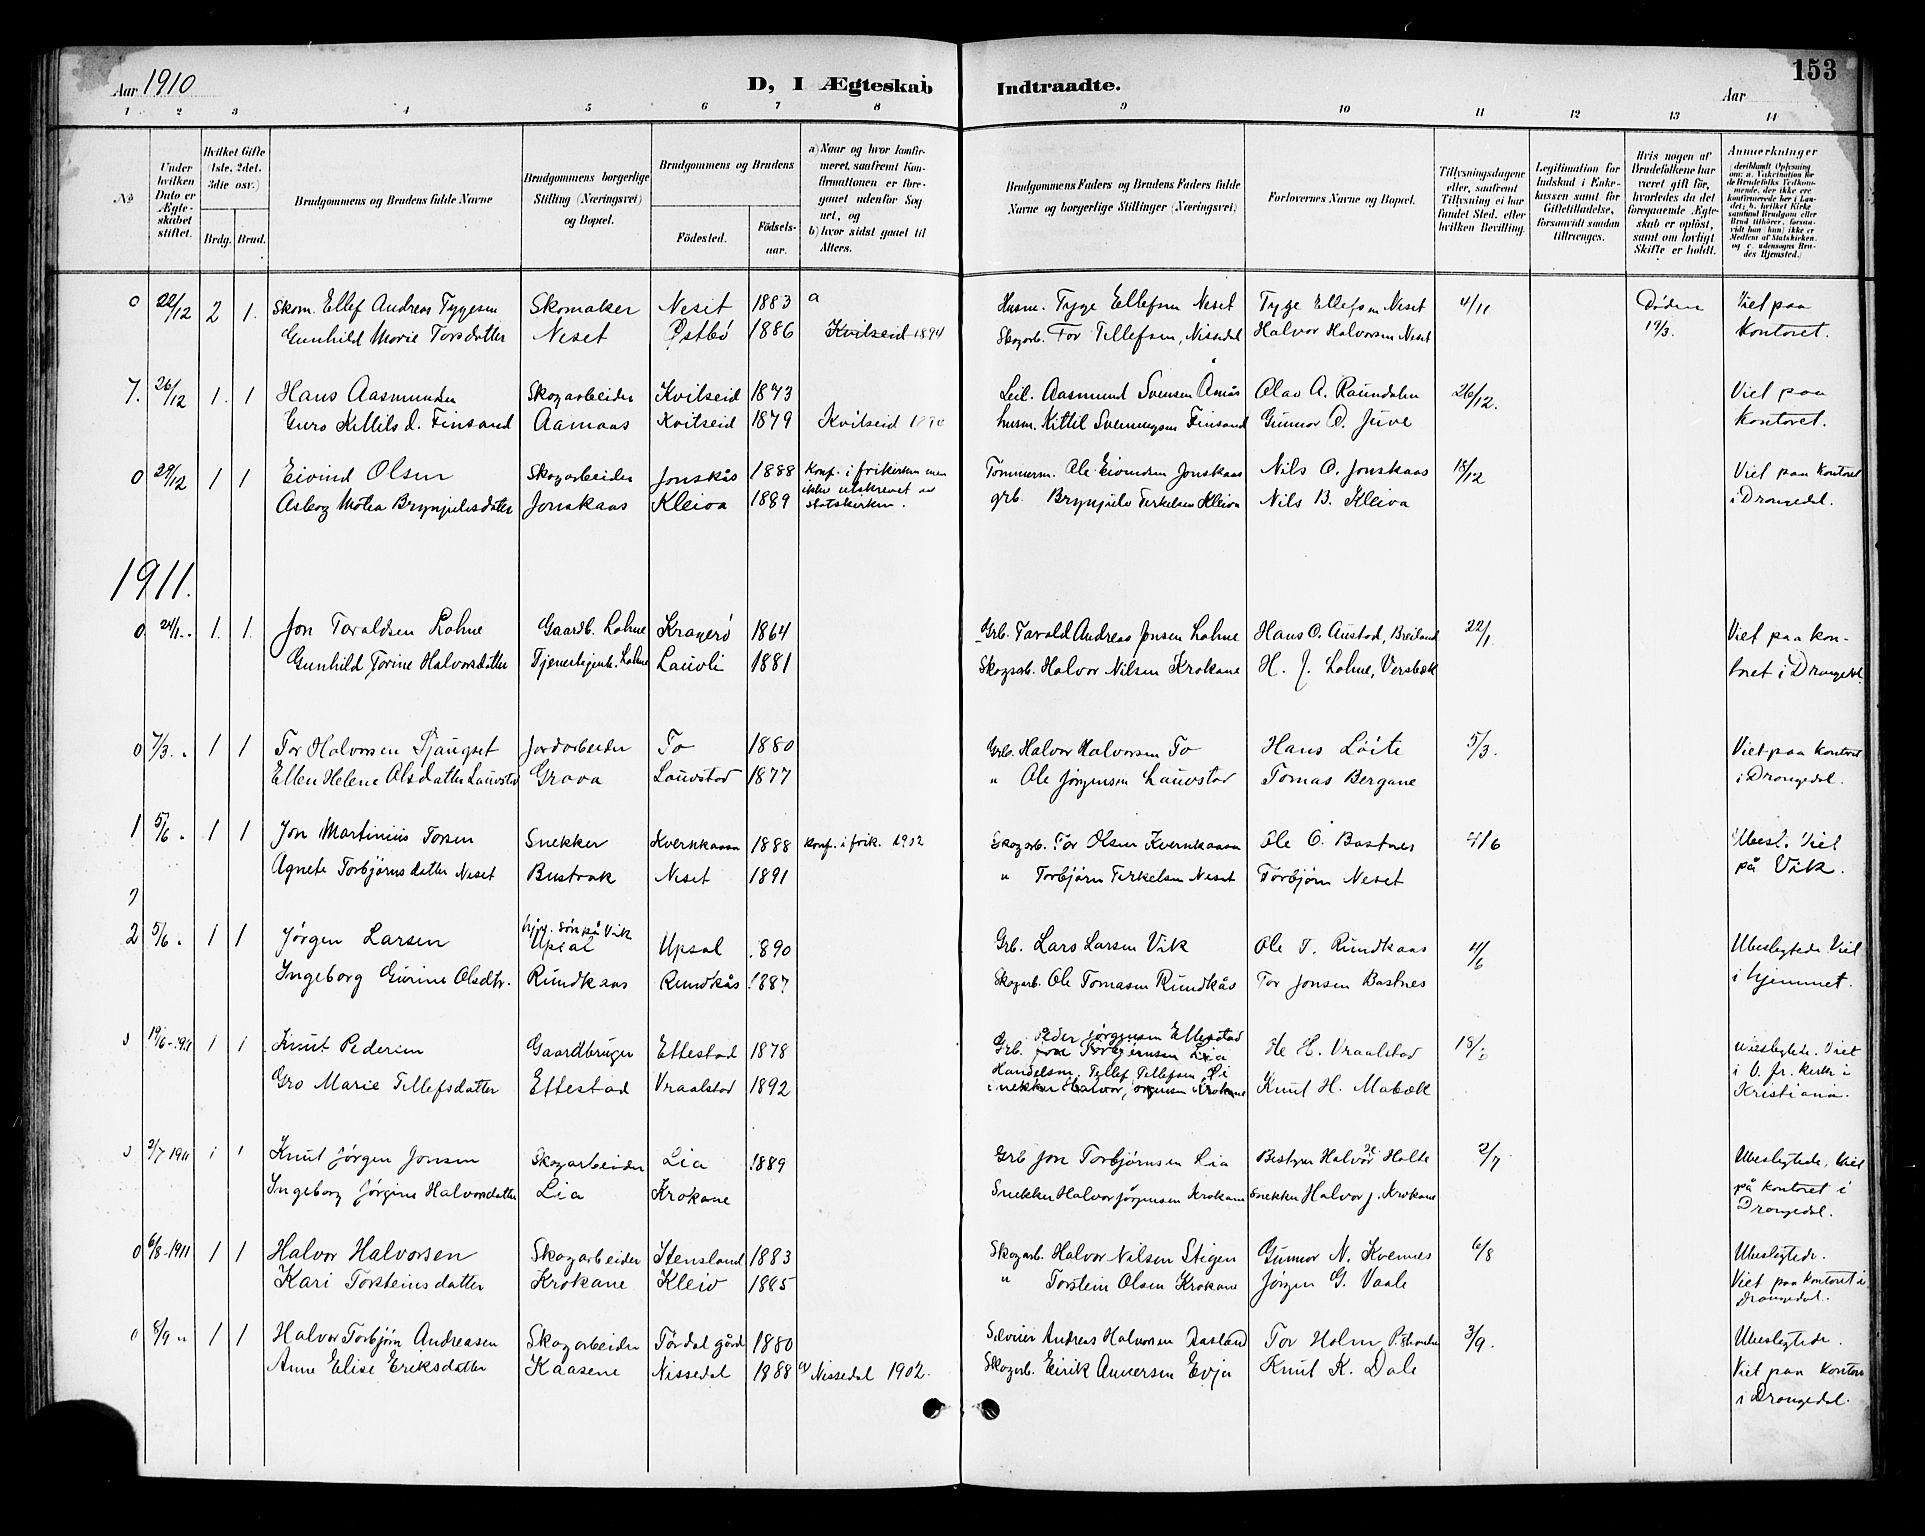 SAKO, Drangedal kirkebøker, G/Gb/L0002: Klokkerbok nr. II 2, 1895-1918, s. 153